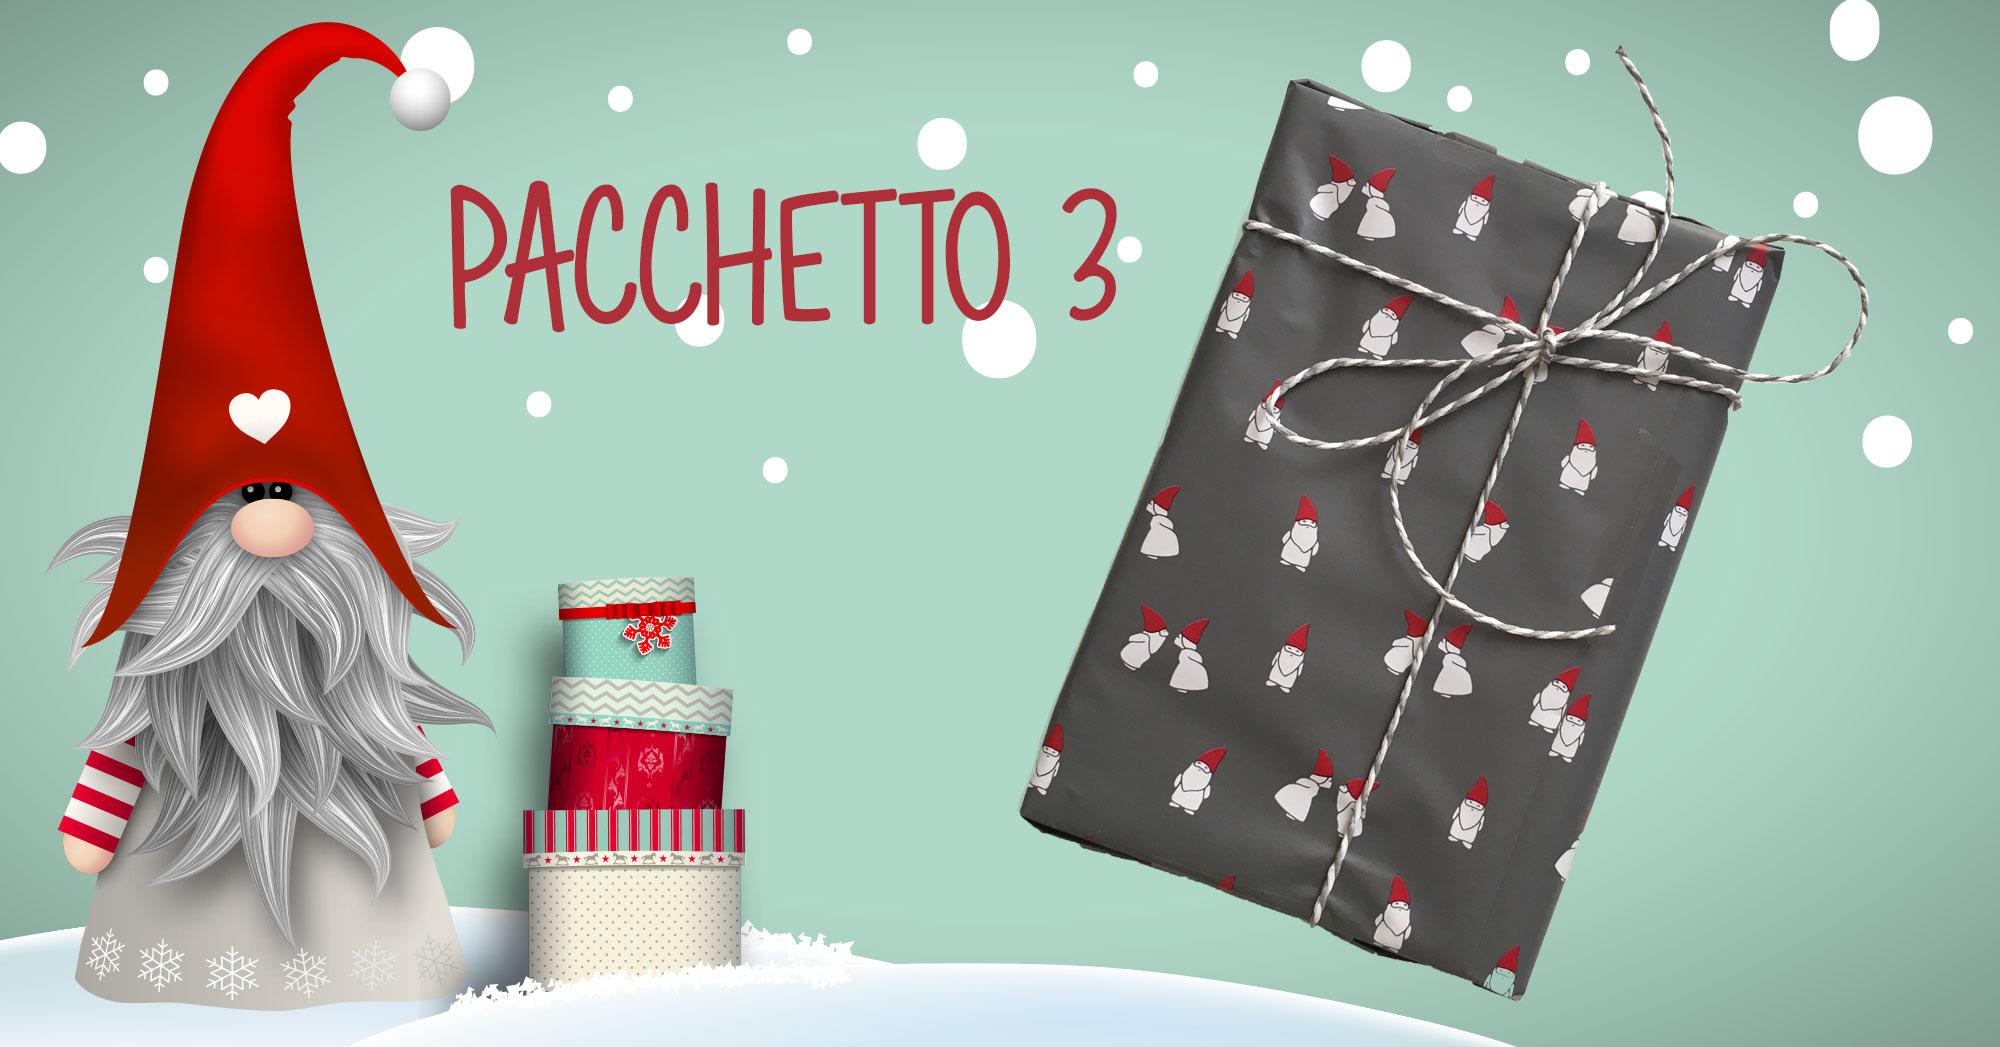 Pacchetto 3